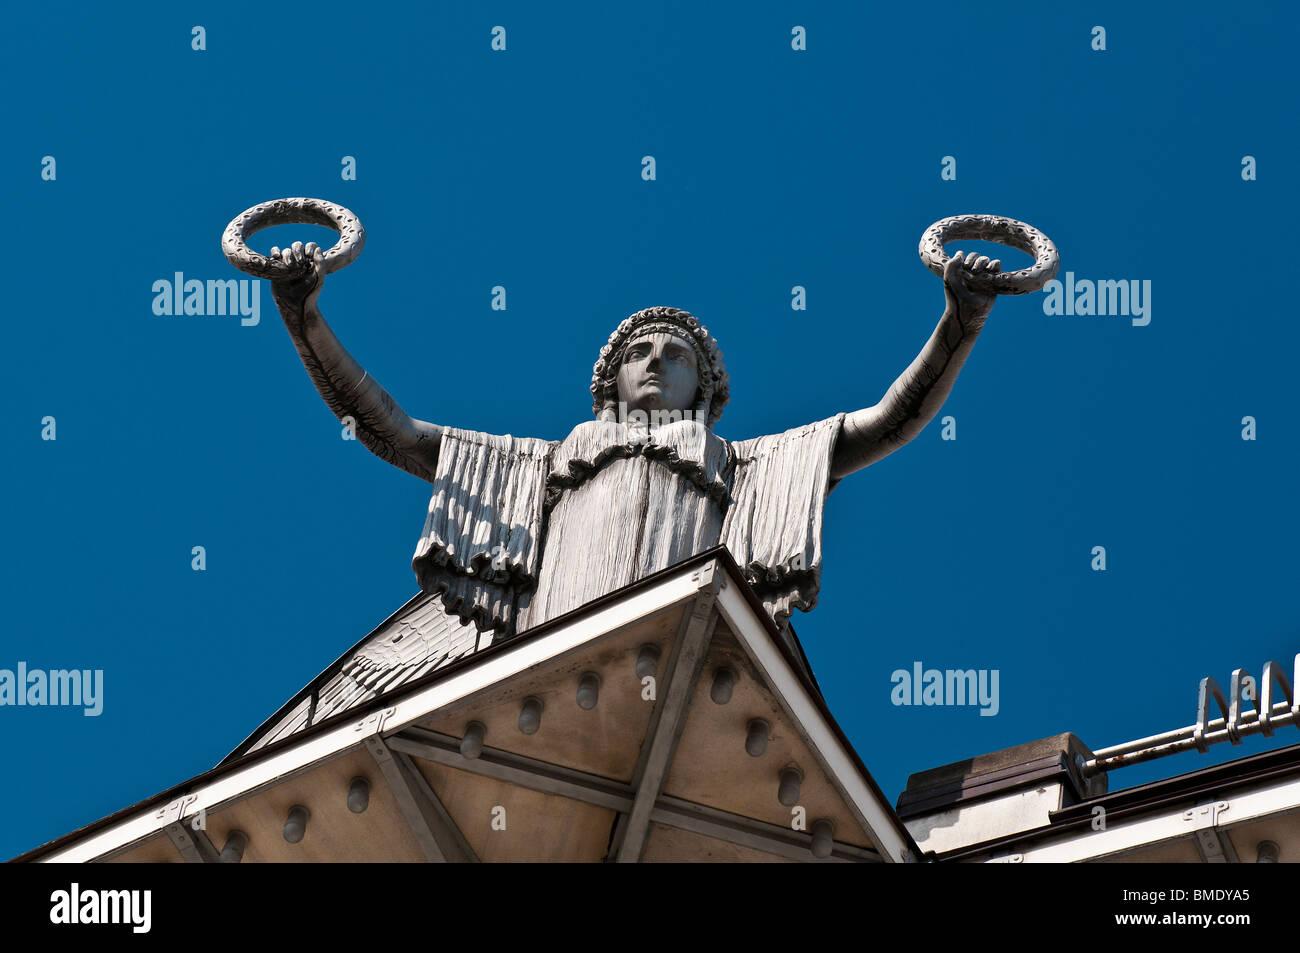 Statue holding laurels by Otto Wagner, Österreichische Postsparkasse (Austrian Postal Savings Bank) building, - Stock Image